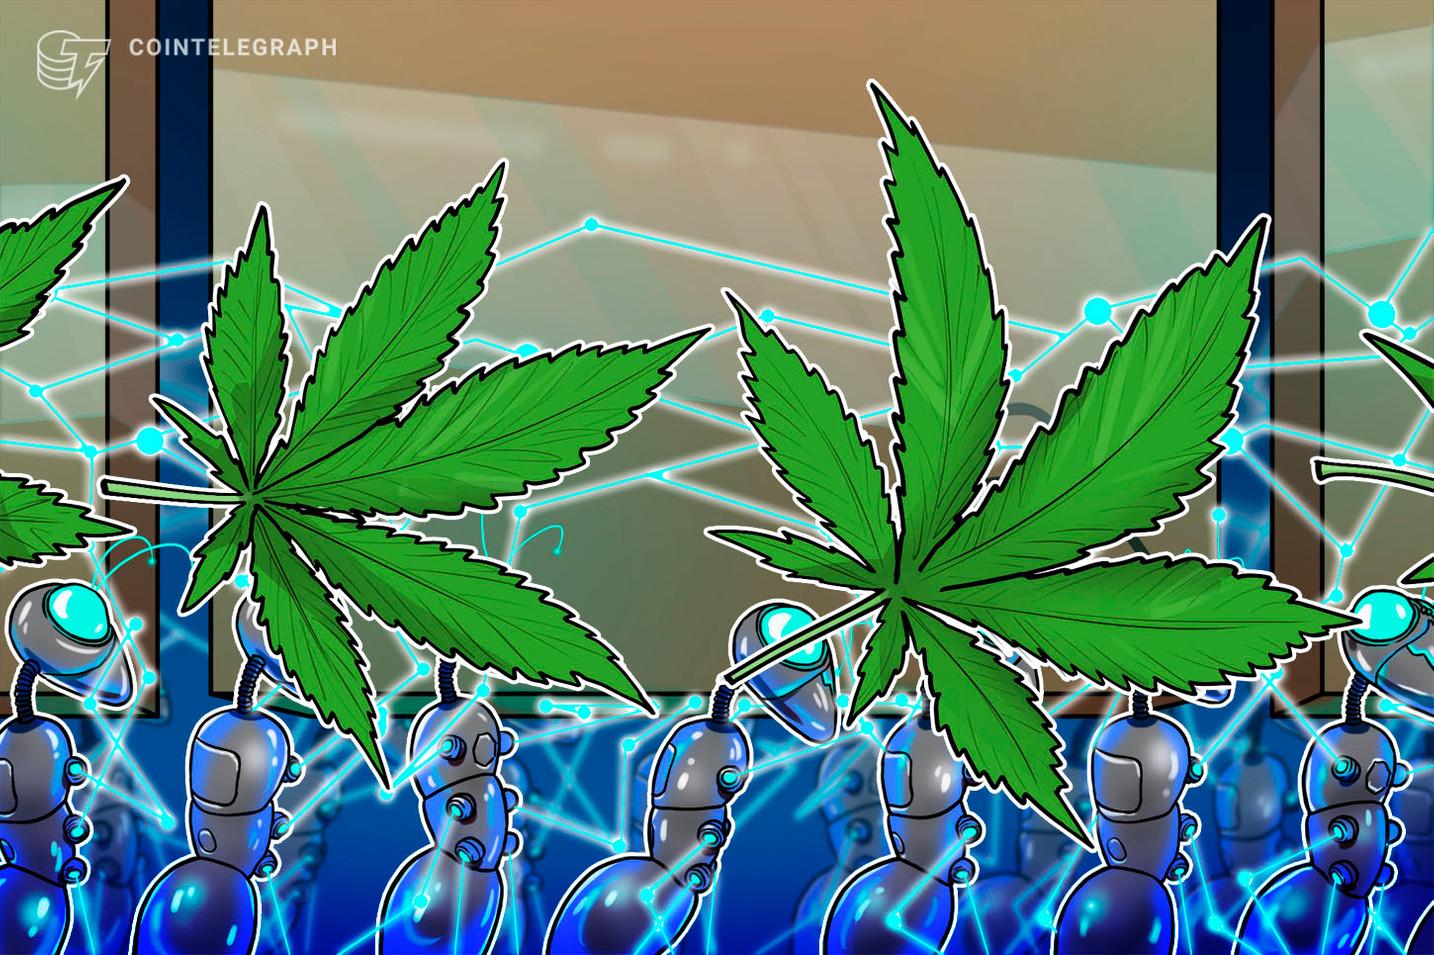 TruTrace se asocia con Deloitte para rastrear el cannabis usando tecnología blockchain